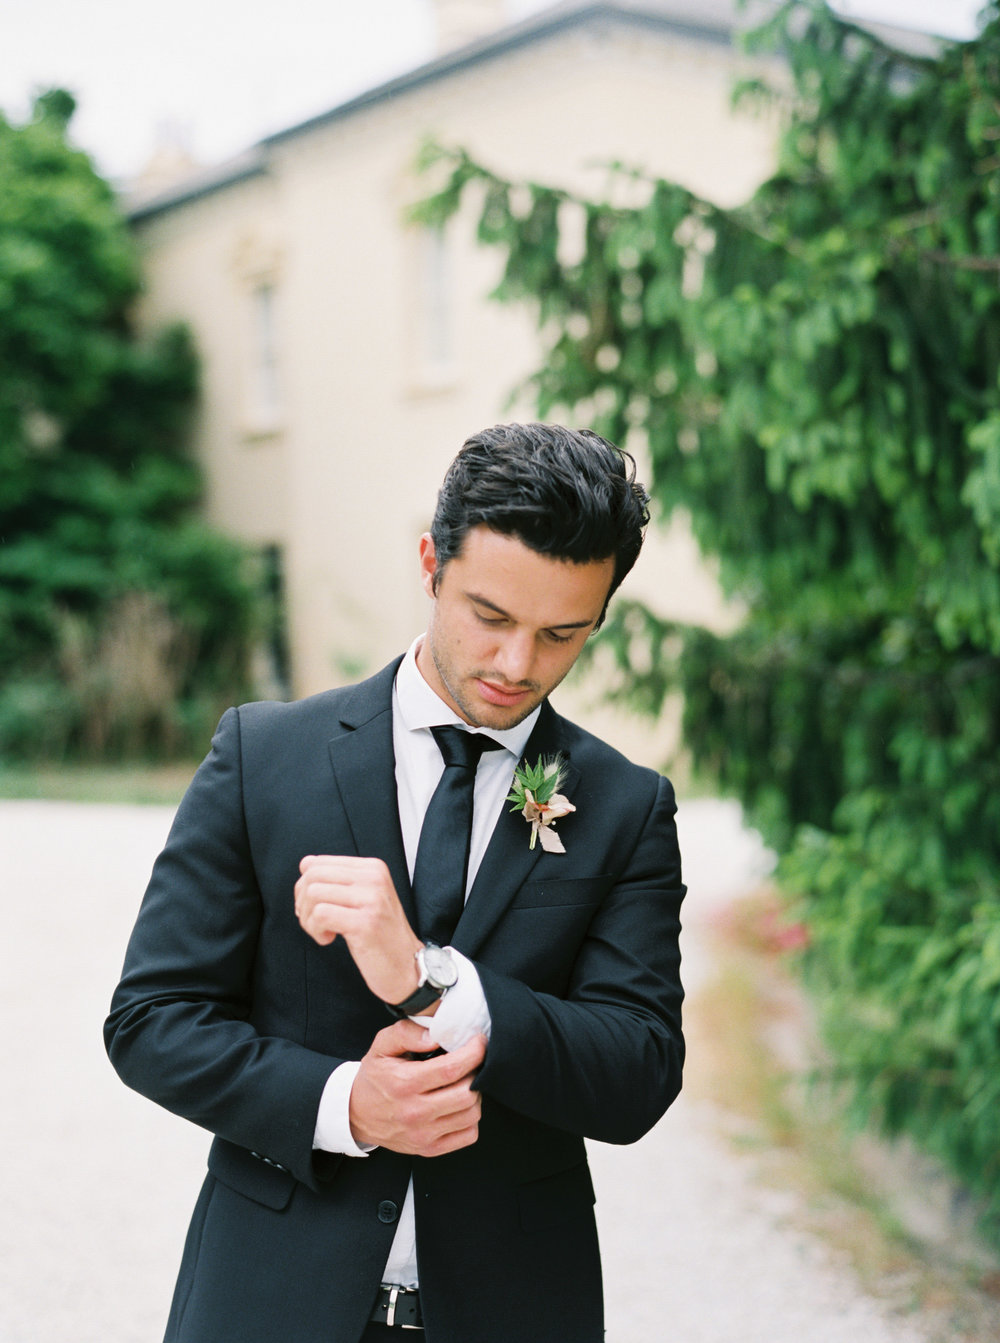 Timeless Southern Highland Wedding Elopement in Bowral NSW Fine Art Film Photographer Sheri McMahon-34.jpg